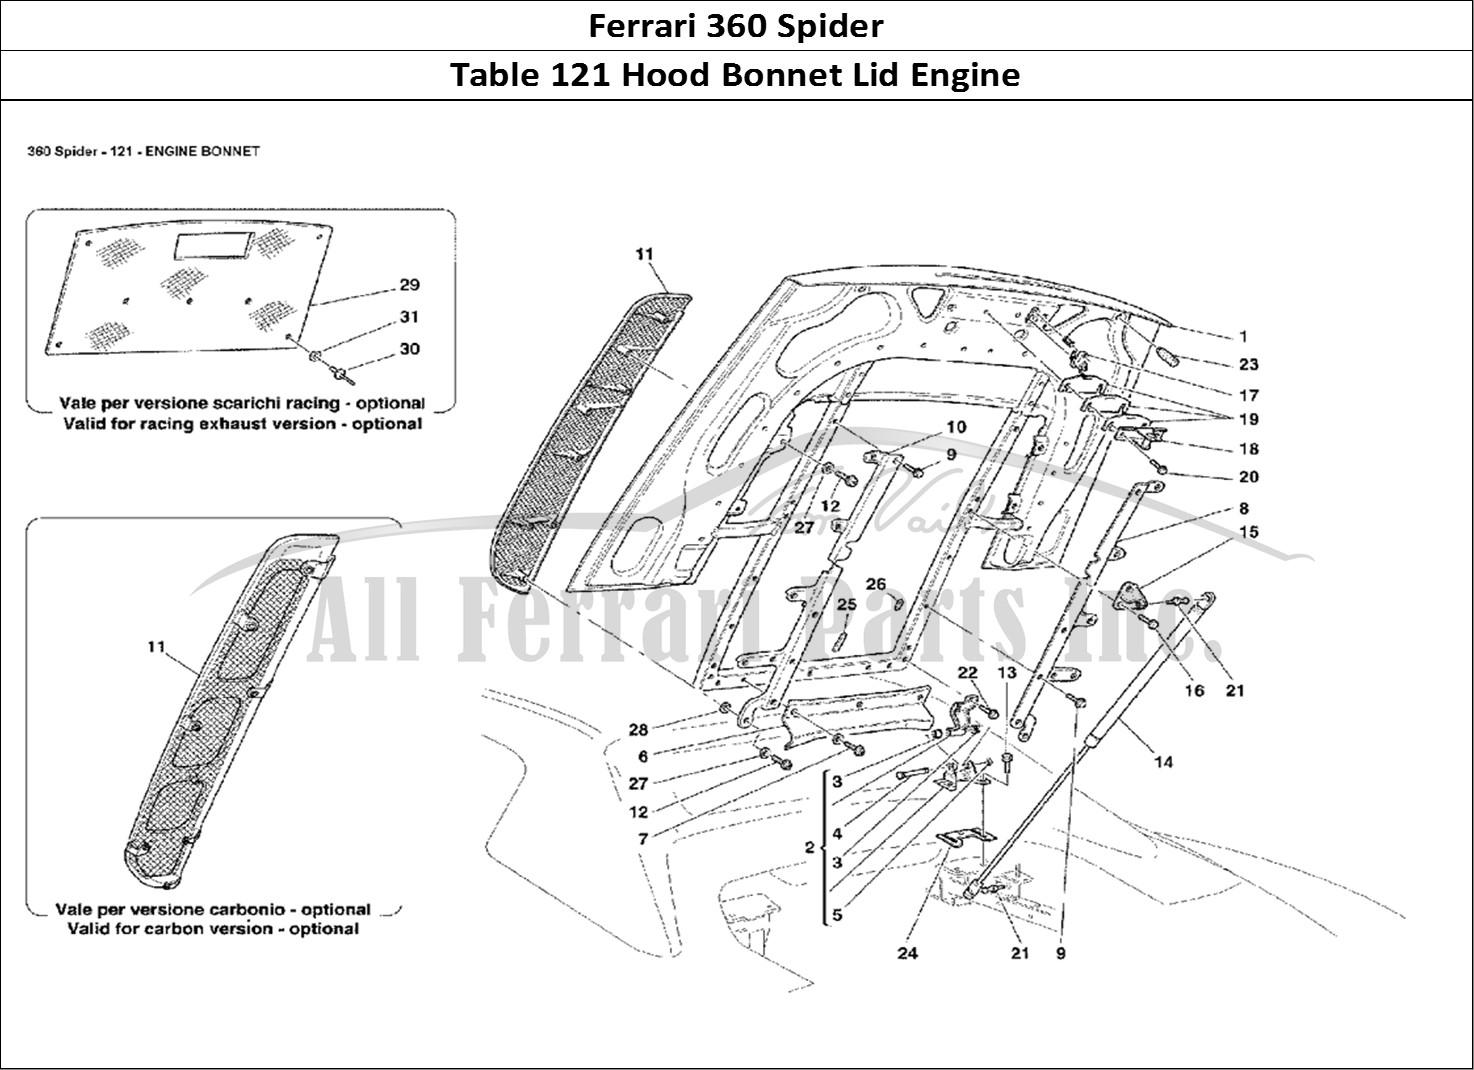 Buy Original Ferrari 360 Spider 121 Hood Bonnet Lid Engine Ferrari Parts Spares Accessories Online